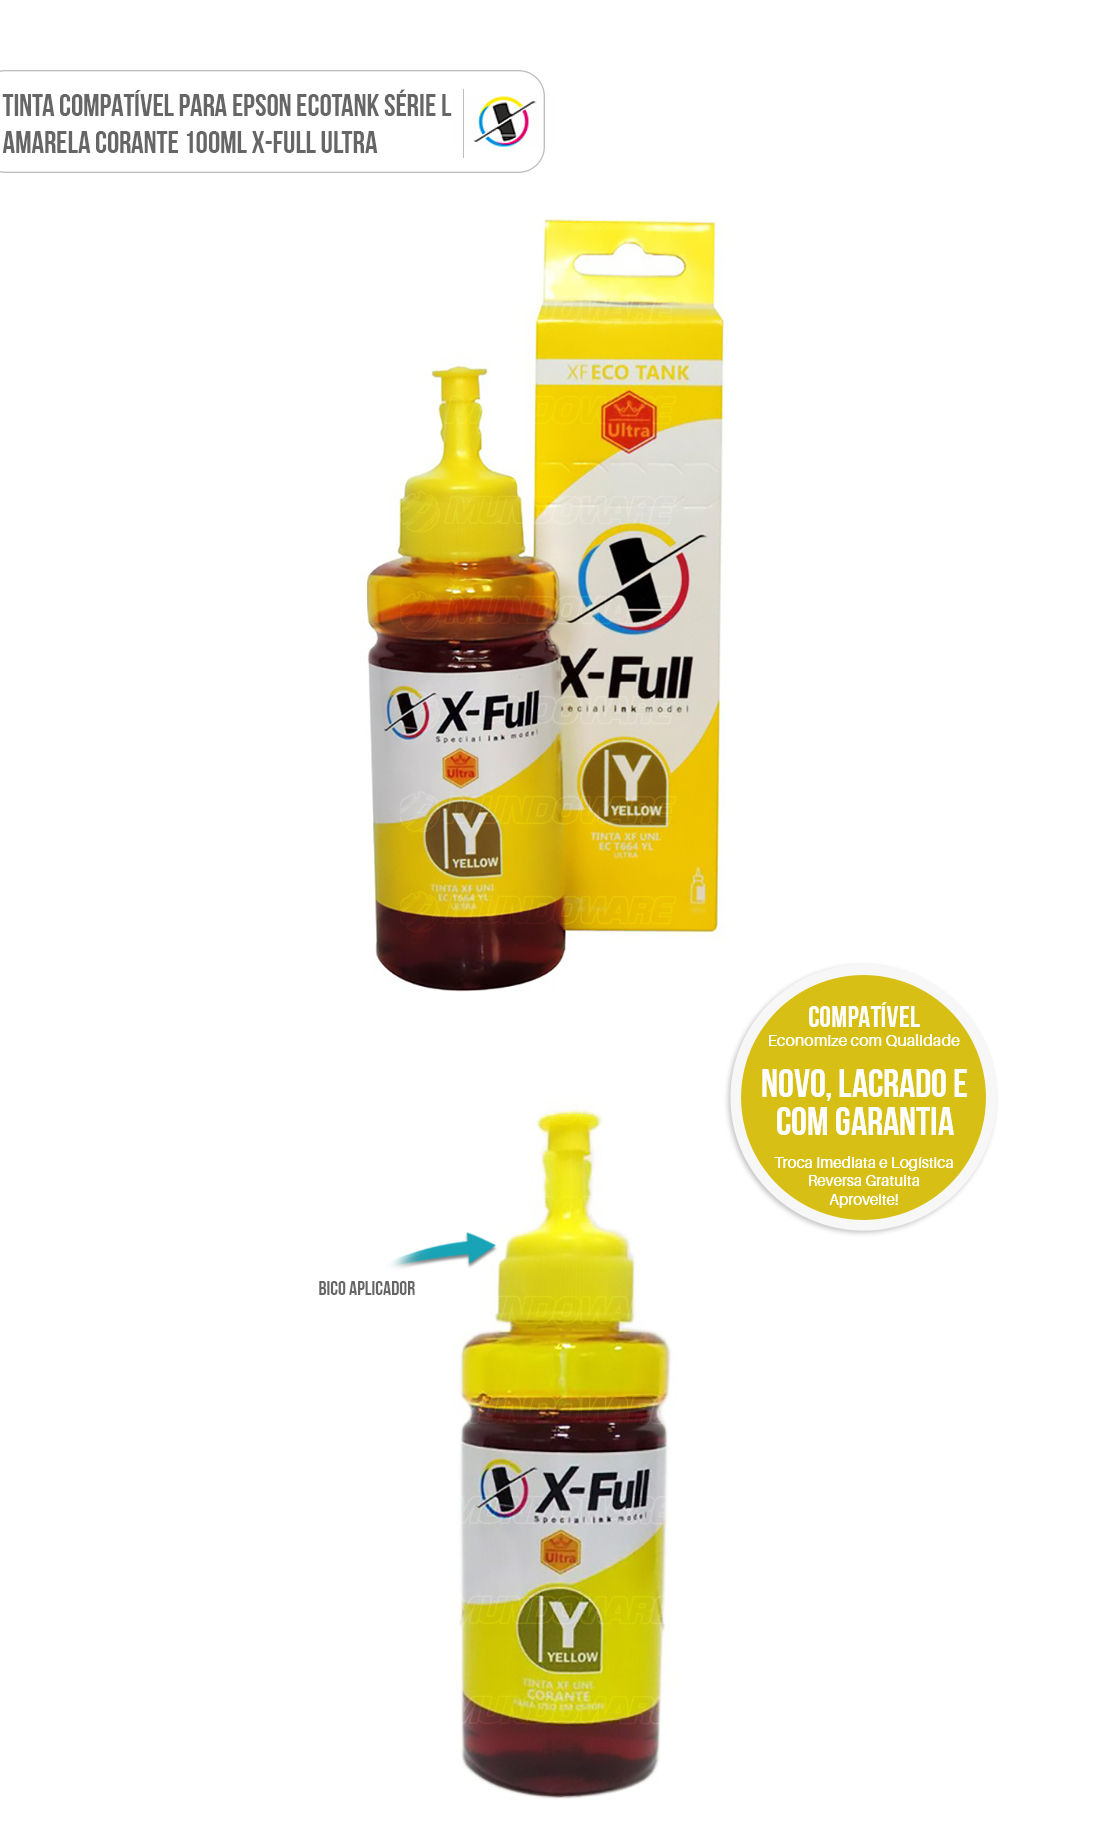 Tinta Refil Corante Ultra Amarelo Compatível para Epson Ecotank série L L200 L210 L220 L355 L365 L375 L555 L575 L800 L805 L1300